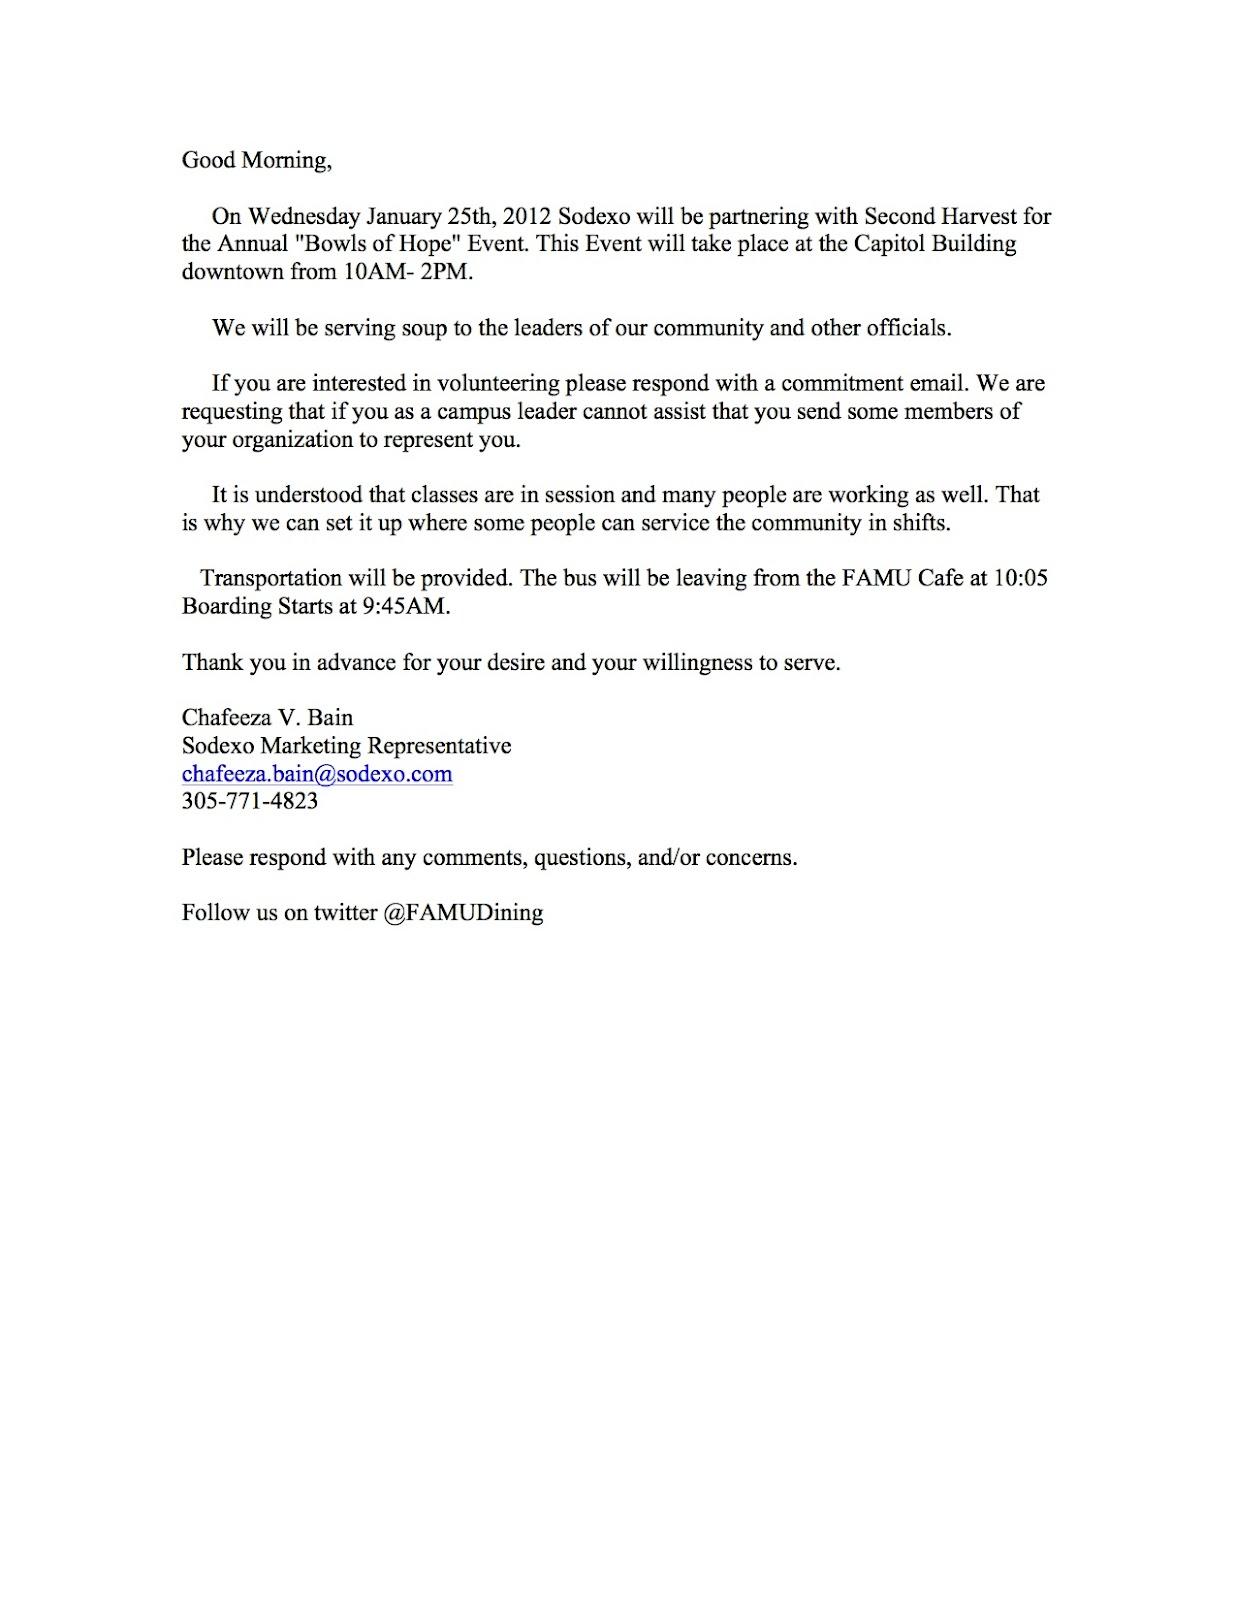 Sample letter of volunteer hours completion inviview youth volunteer cover letter community service completion spiritdancerdesigns Images